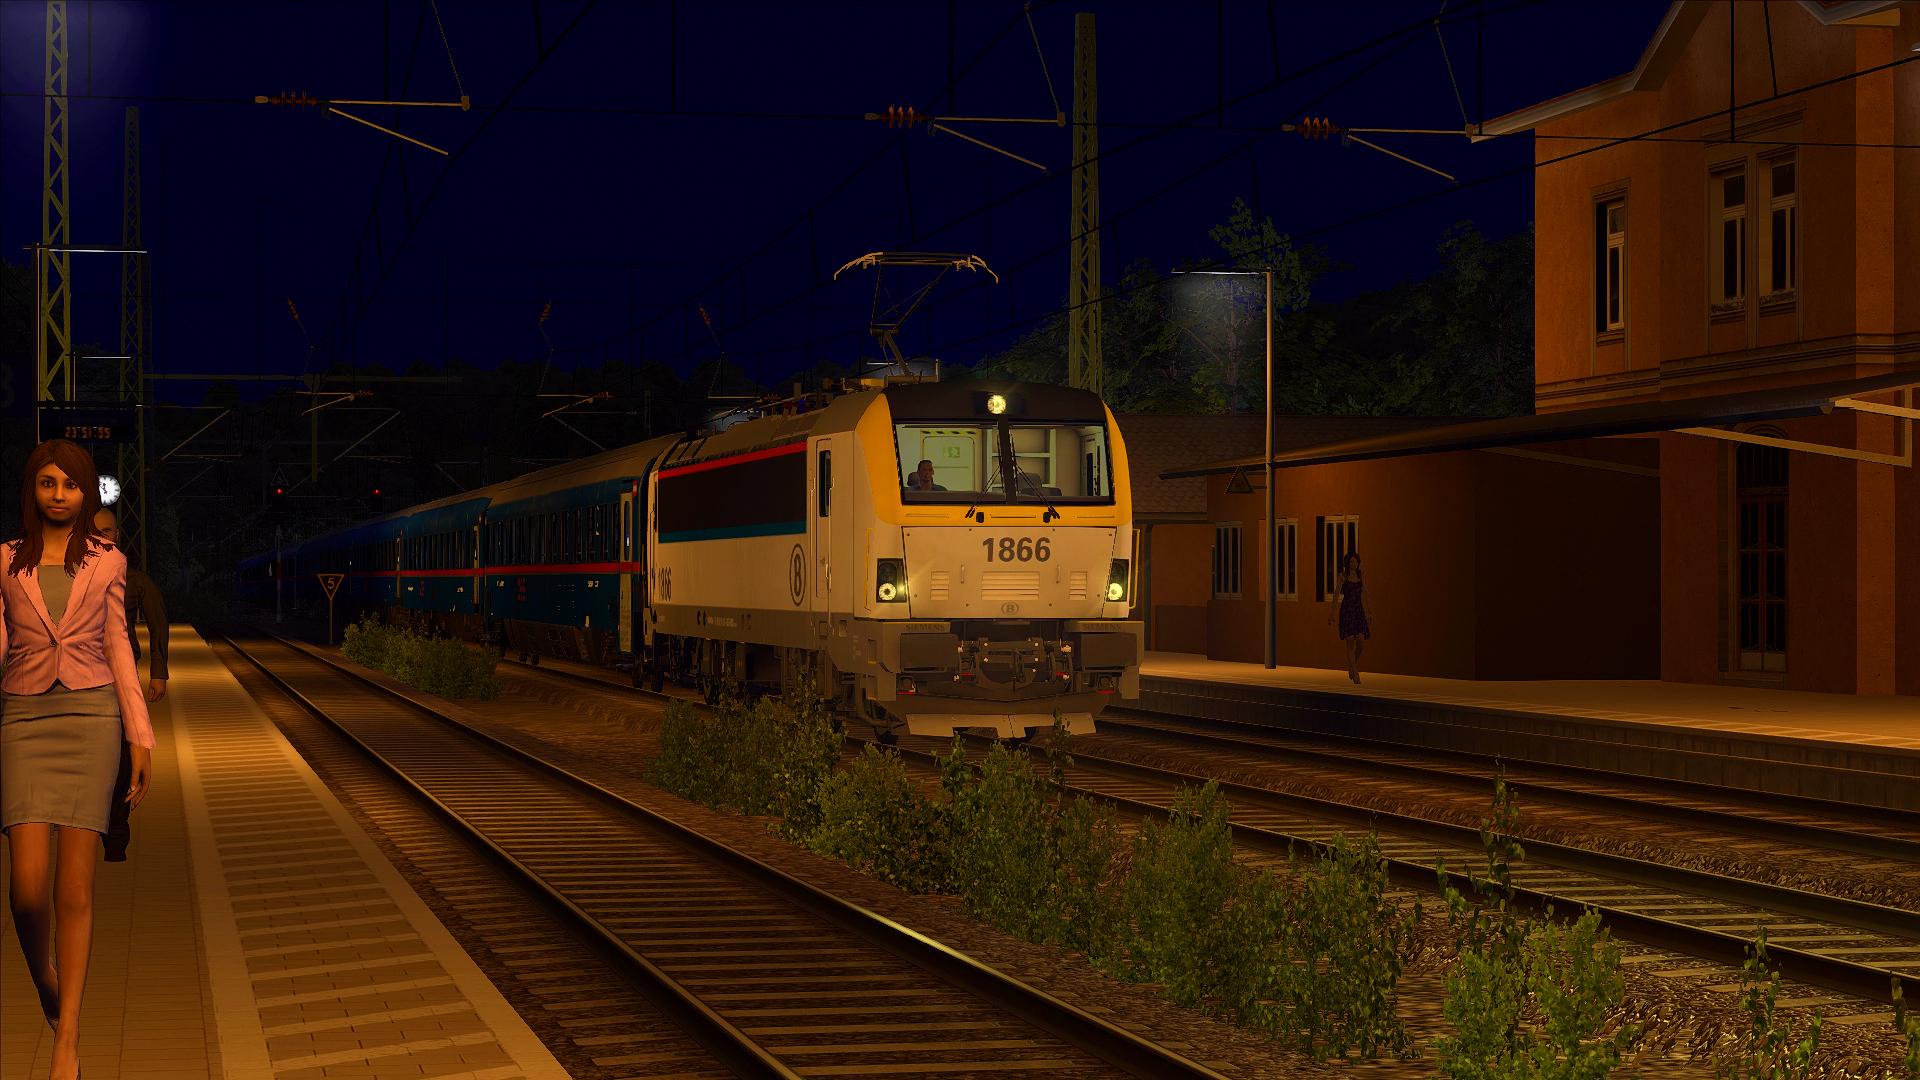 RailWorks64_2021-04-06_22-24-04.jpg